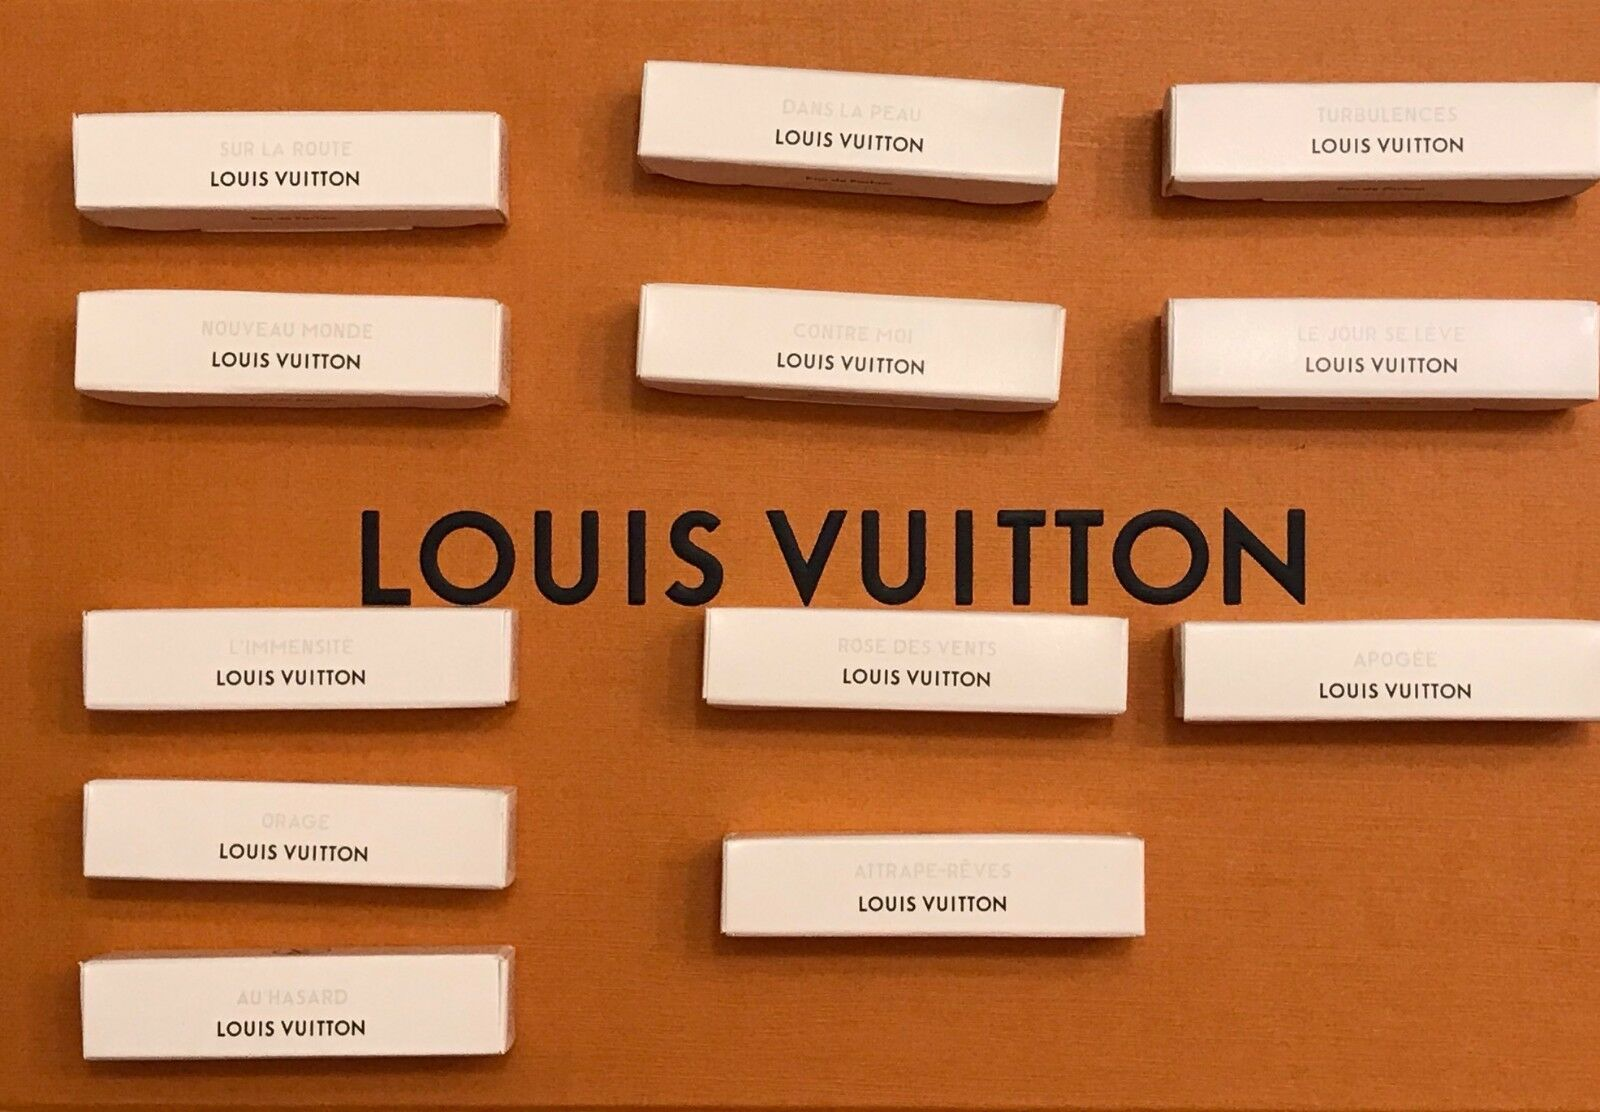 Louis Vuitton 2ml EDP Parfum Travel spray samples NICHE FRAGRANCE 100 Authentic